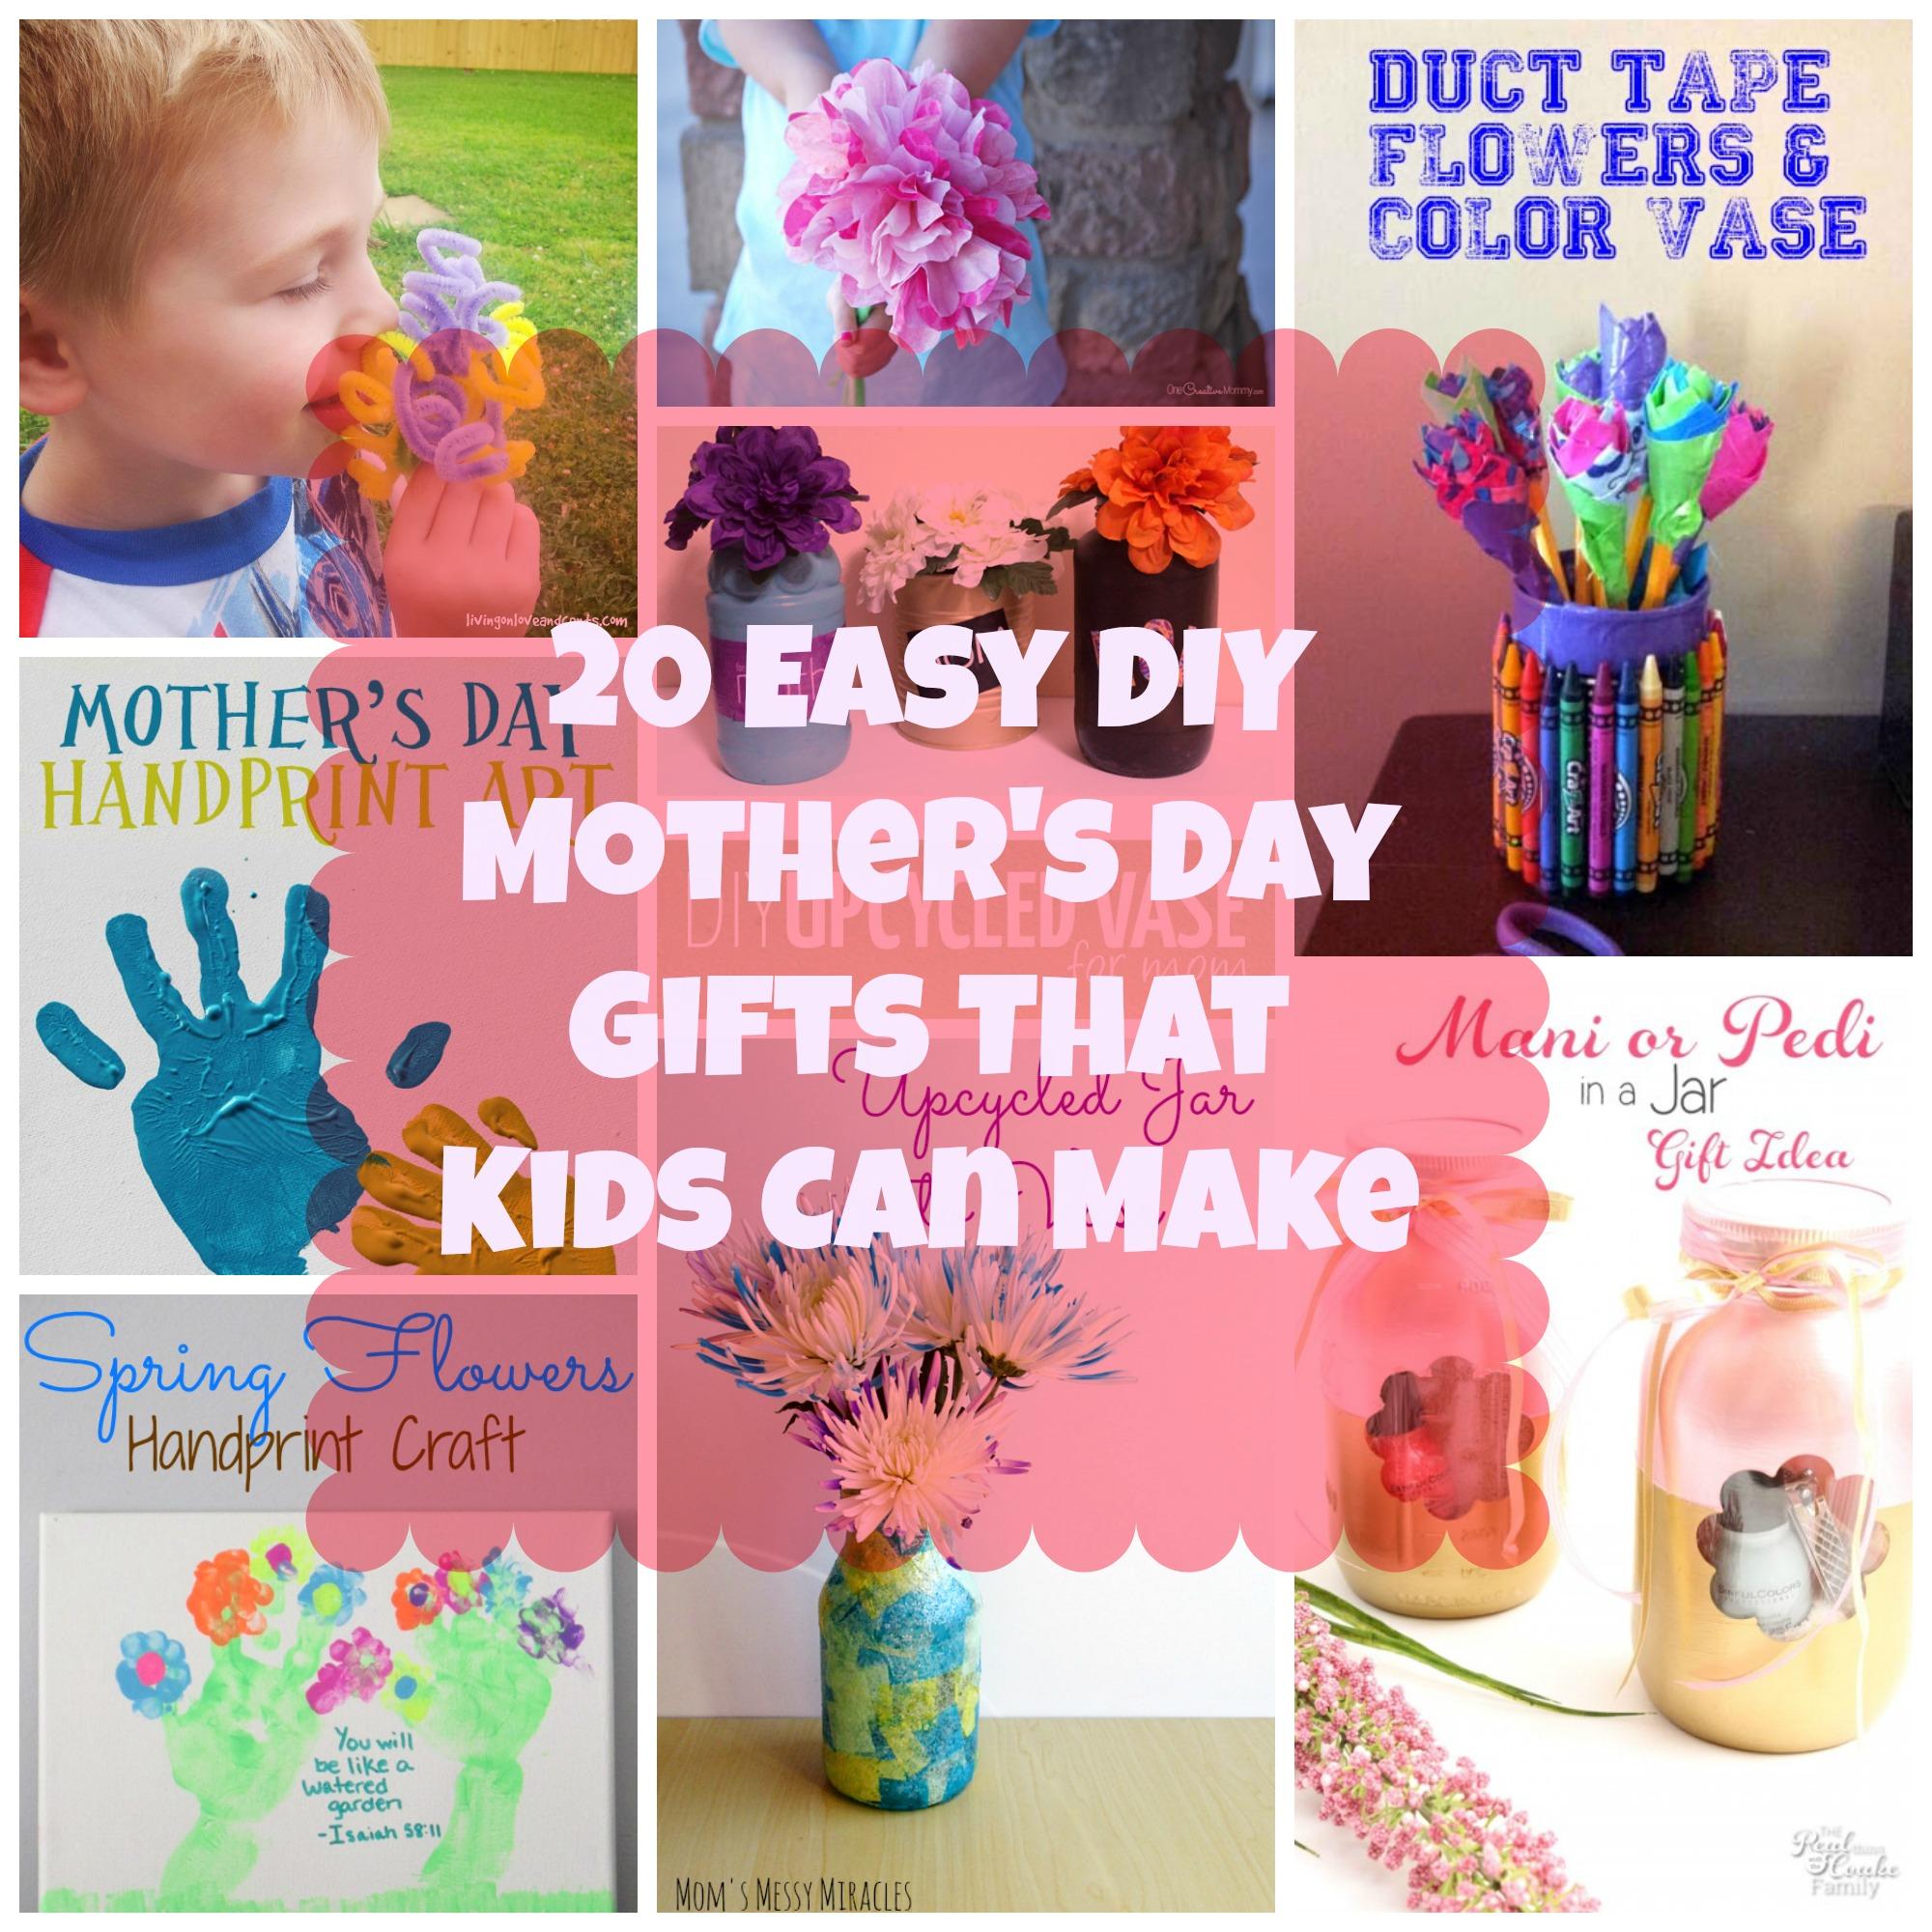 20 easy diy mother